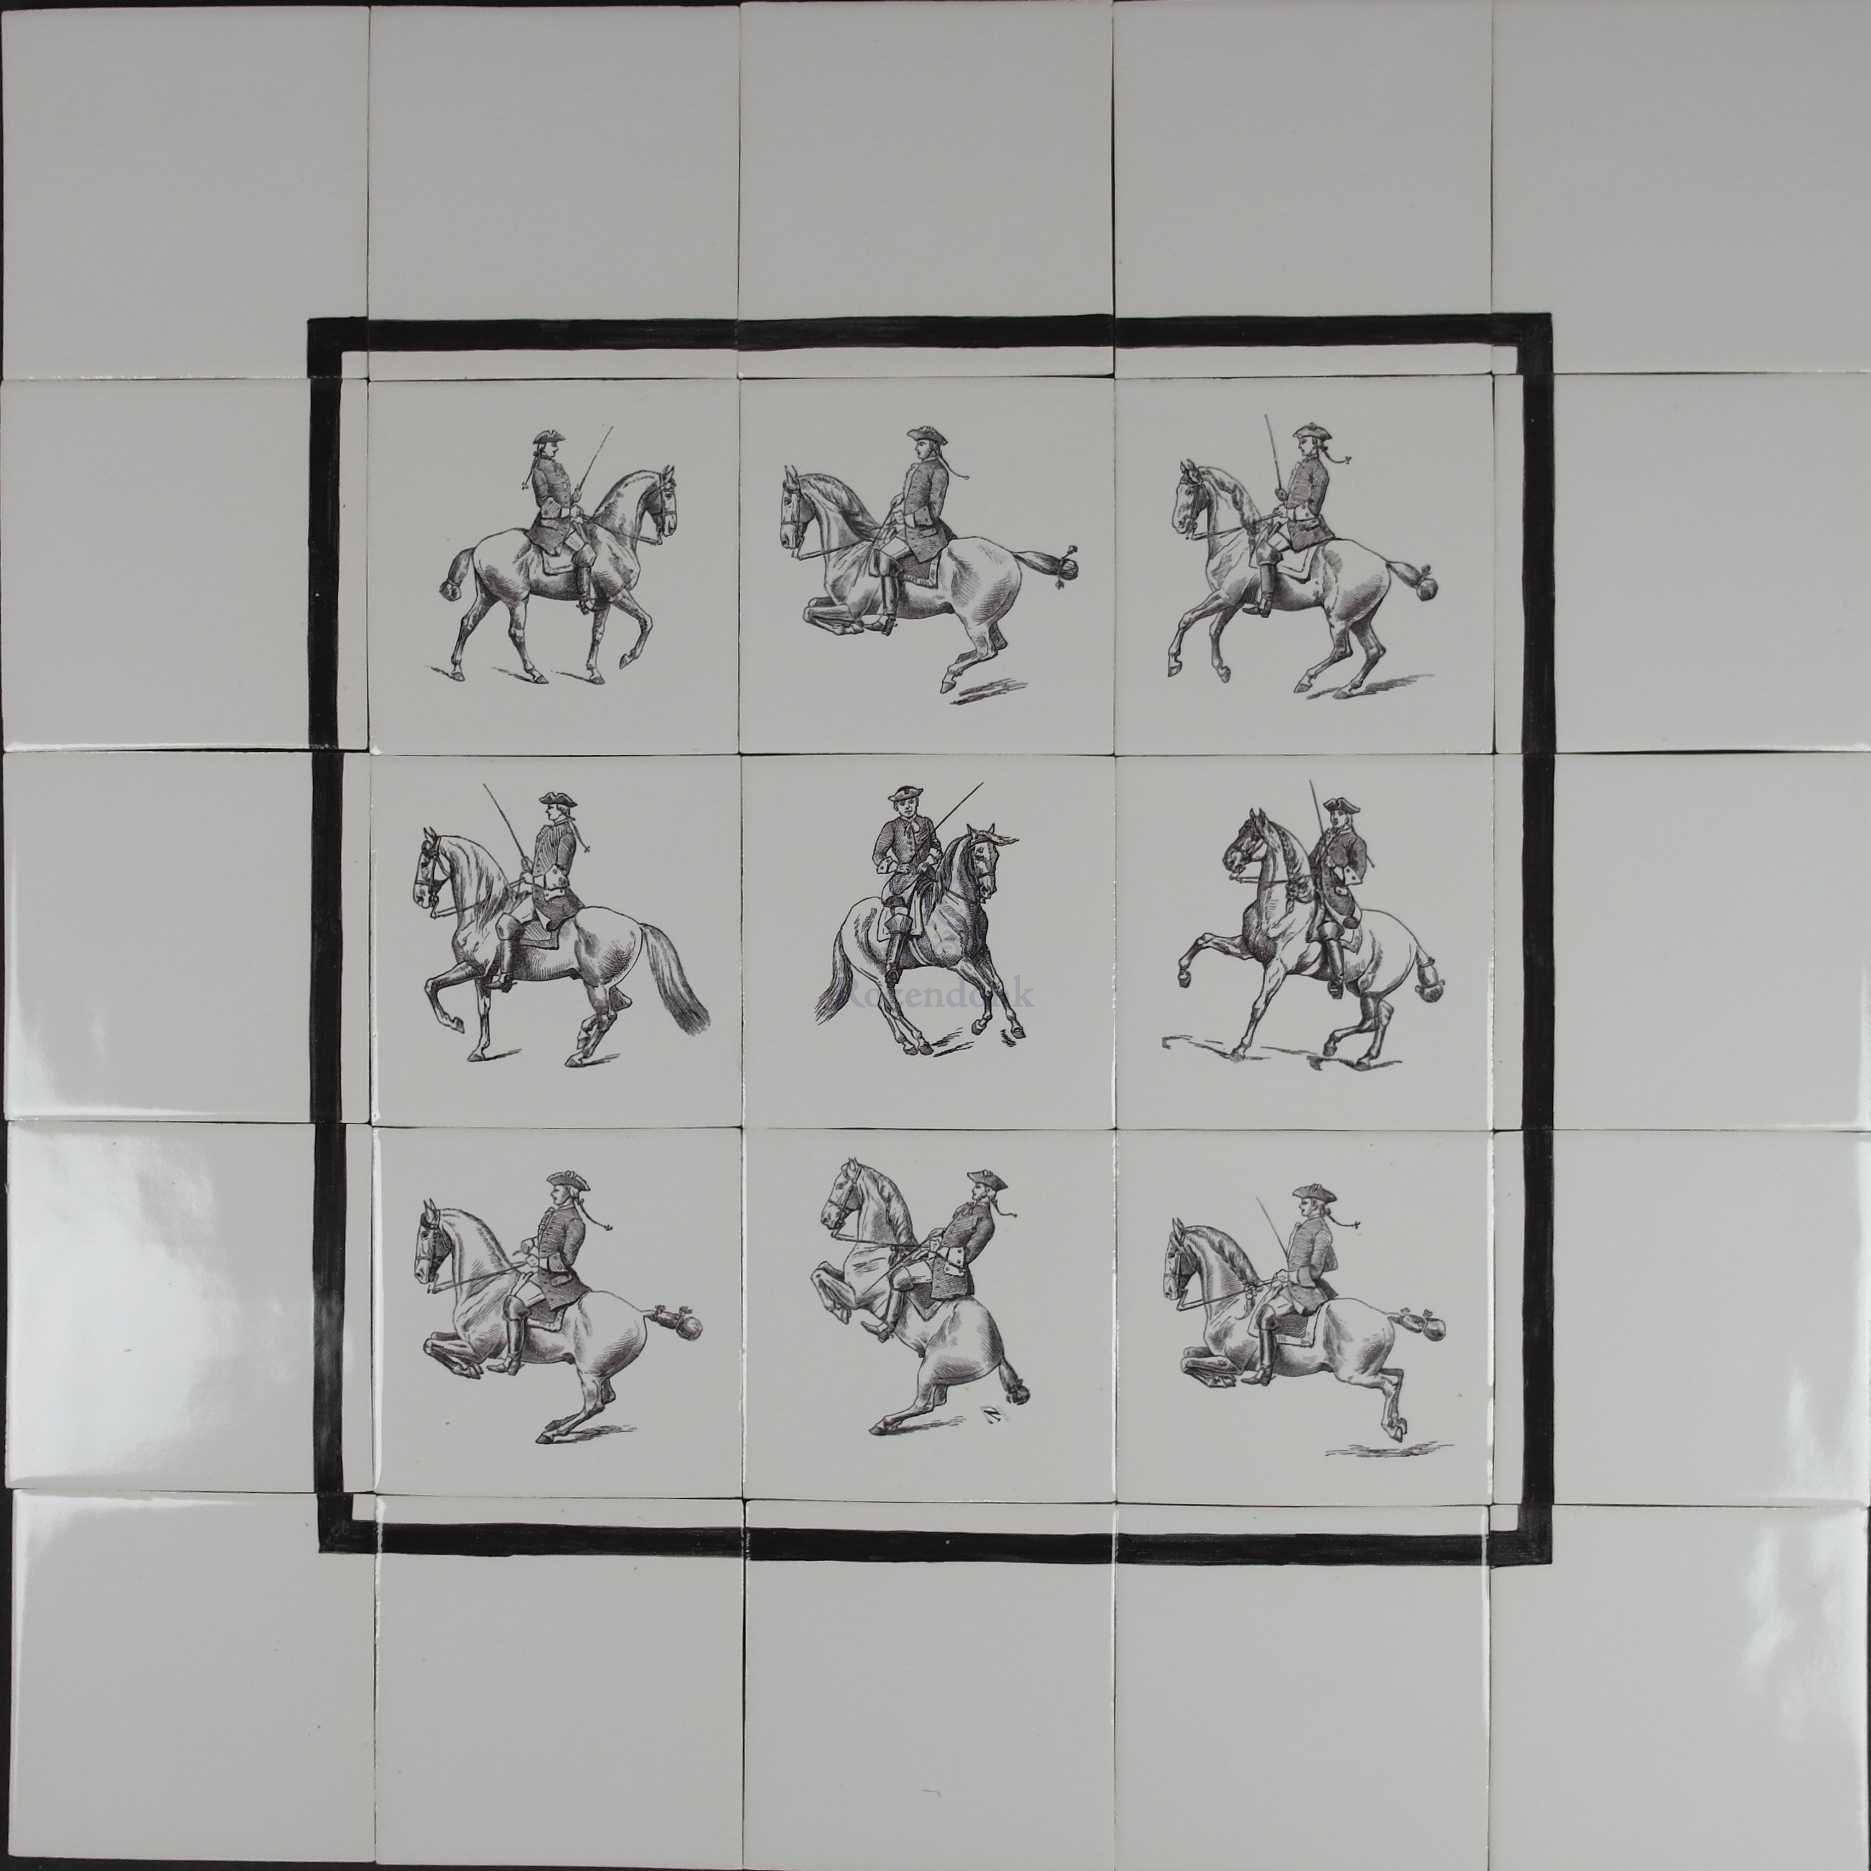 Prints of riding school